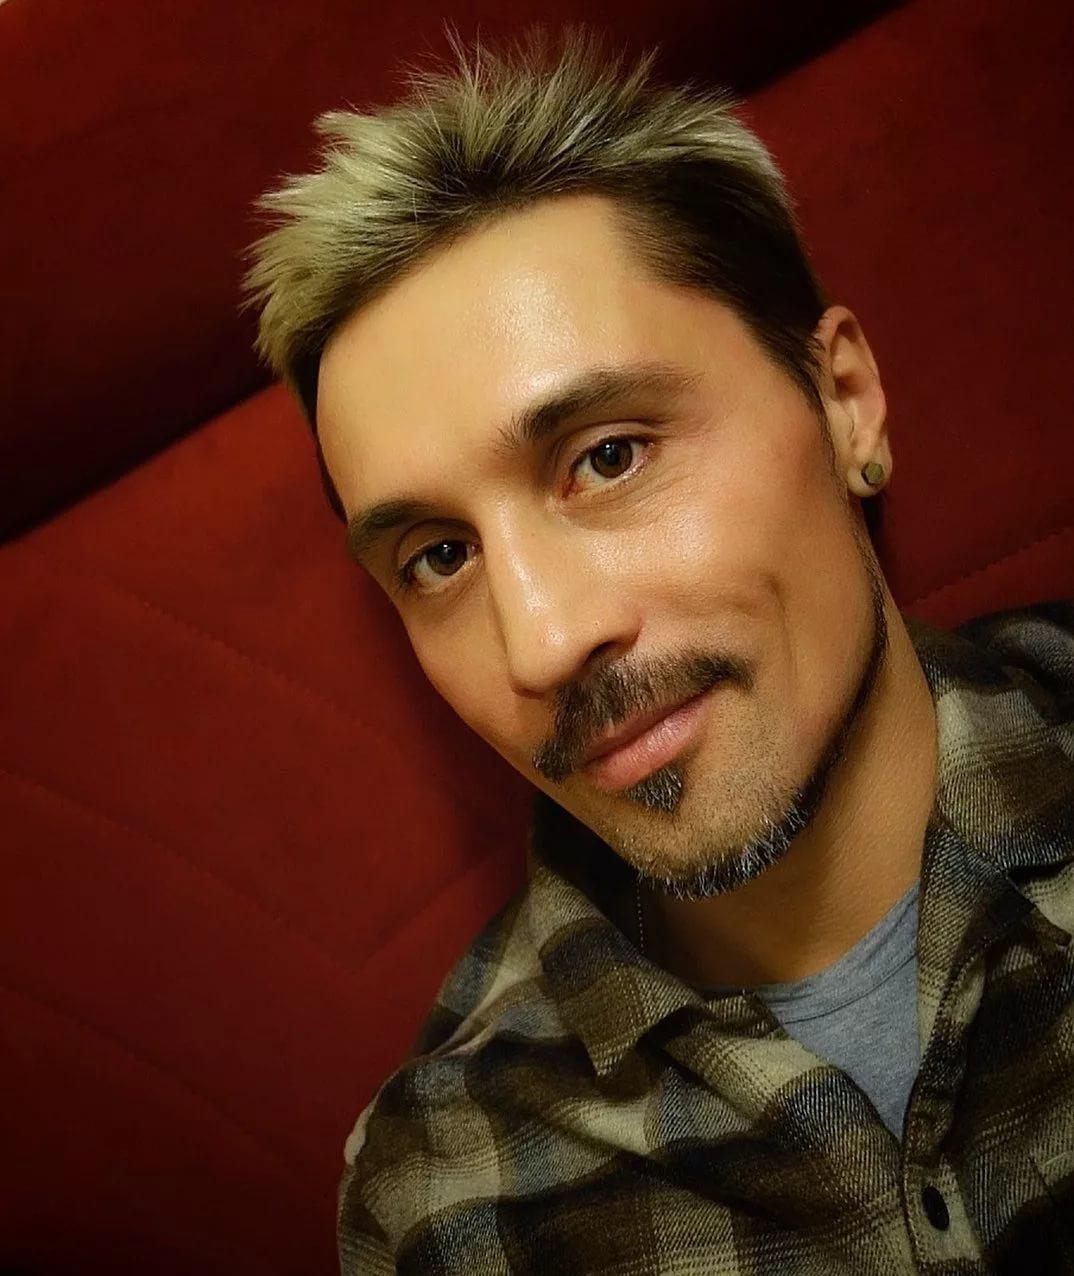 Дима билан — фото, биография, личная жизнь, новости, песни 2020 - 24сми